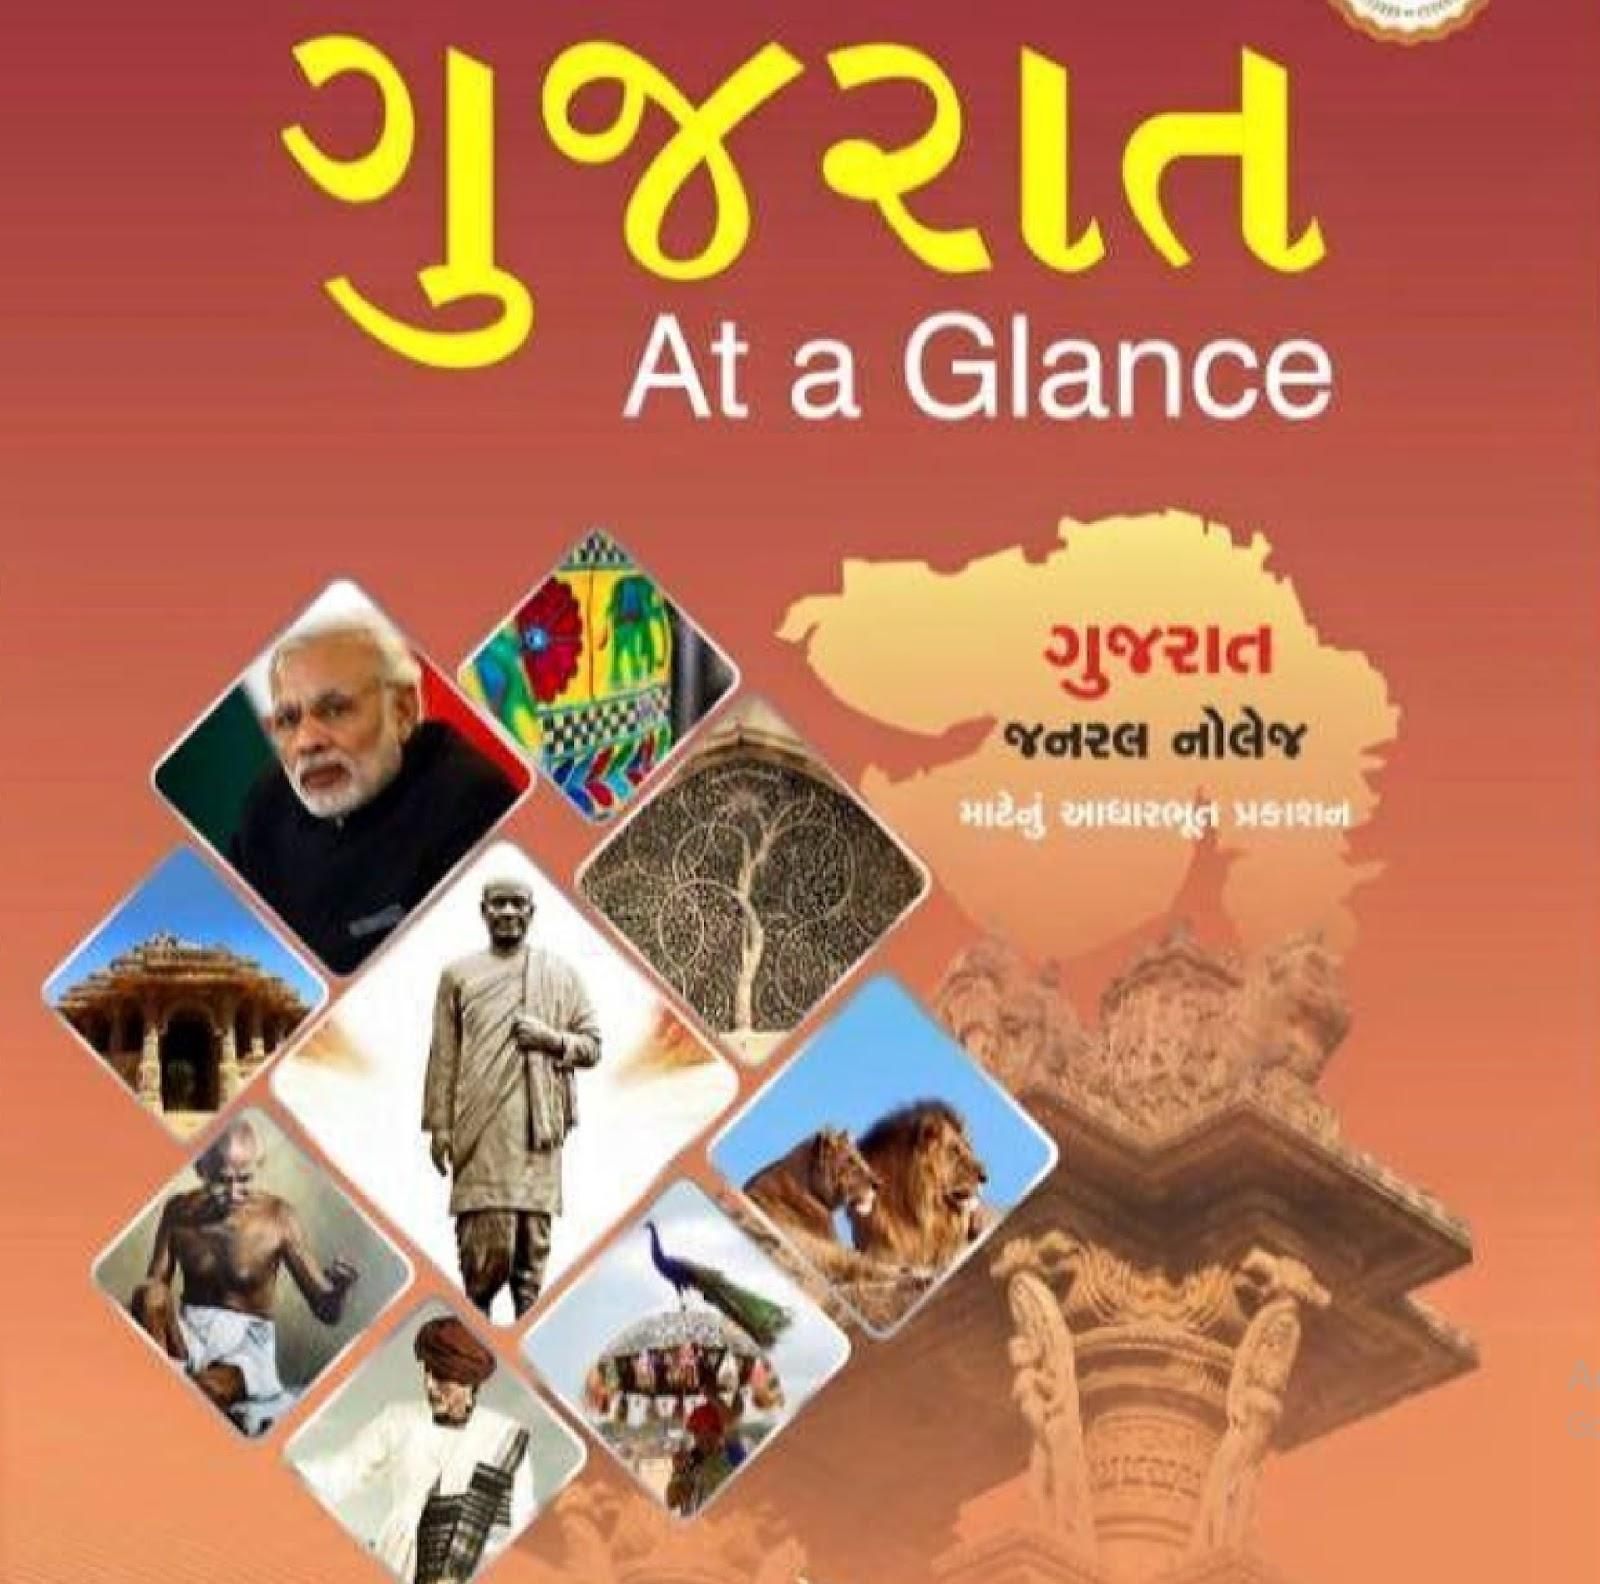 Gujarati news paper pdf telegram channel. how to make a telegram channel private.